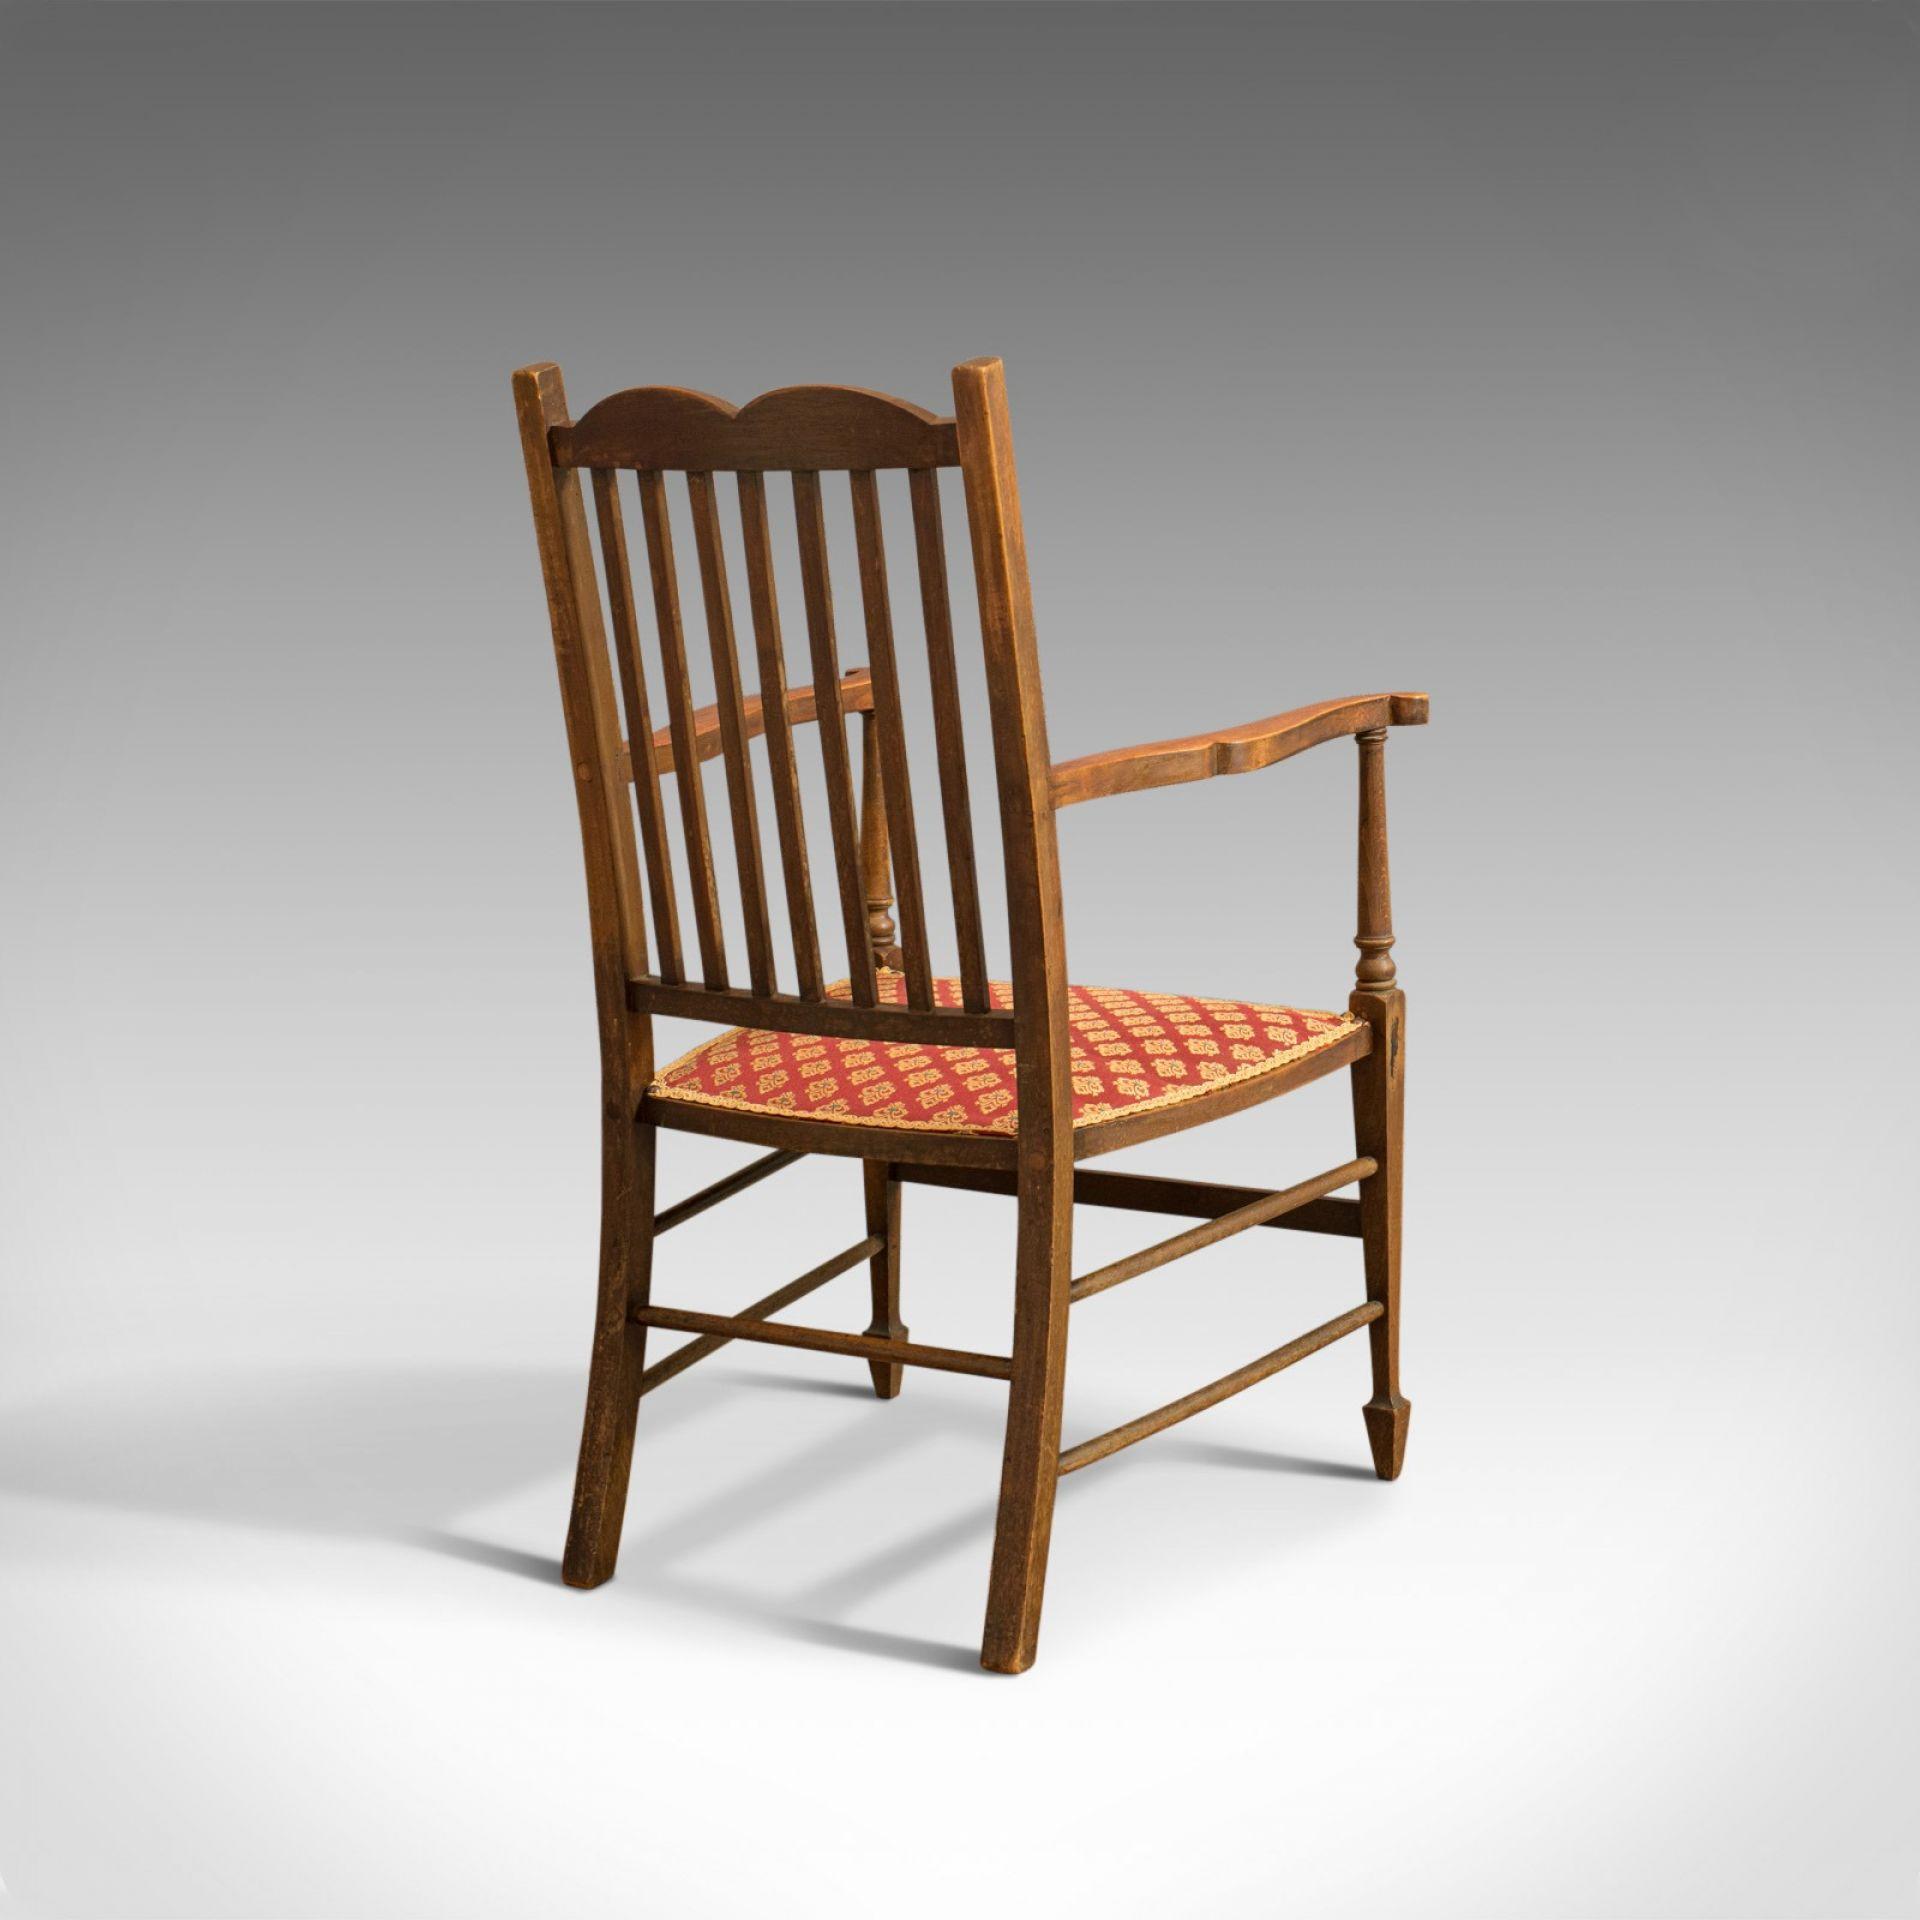 Antique Open Armchair, English, Mahogany, Elbow, Chair, Edwardian